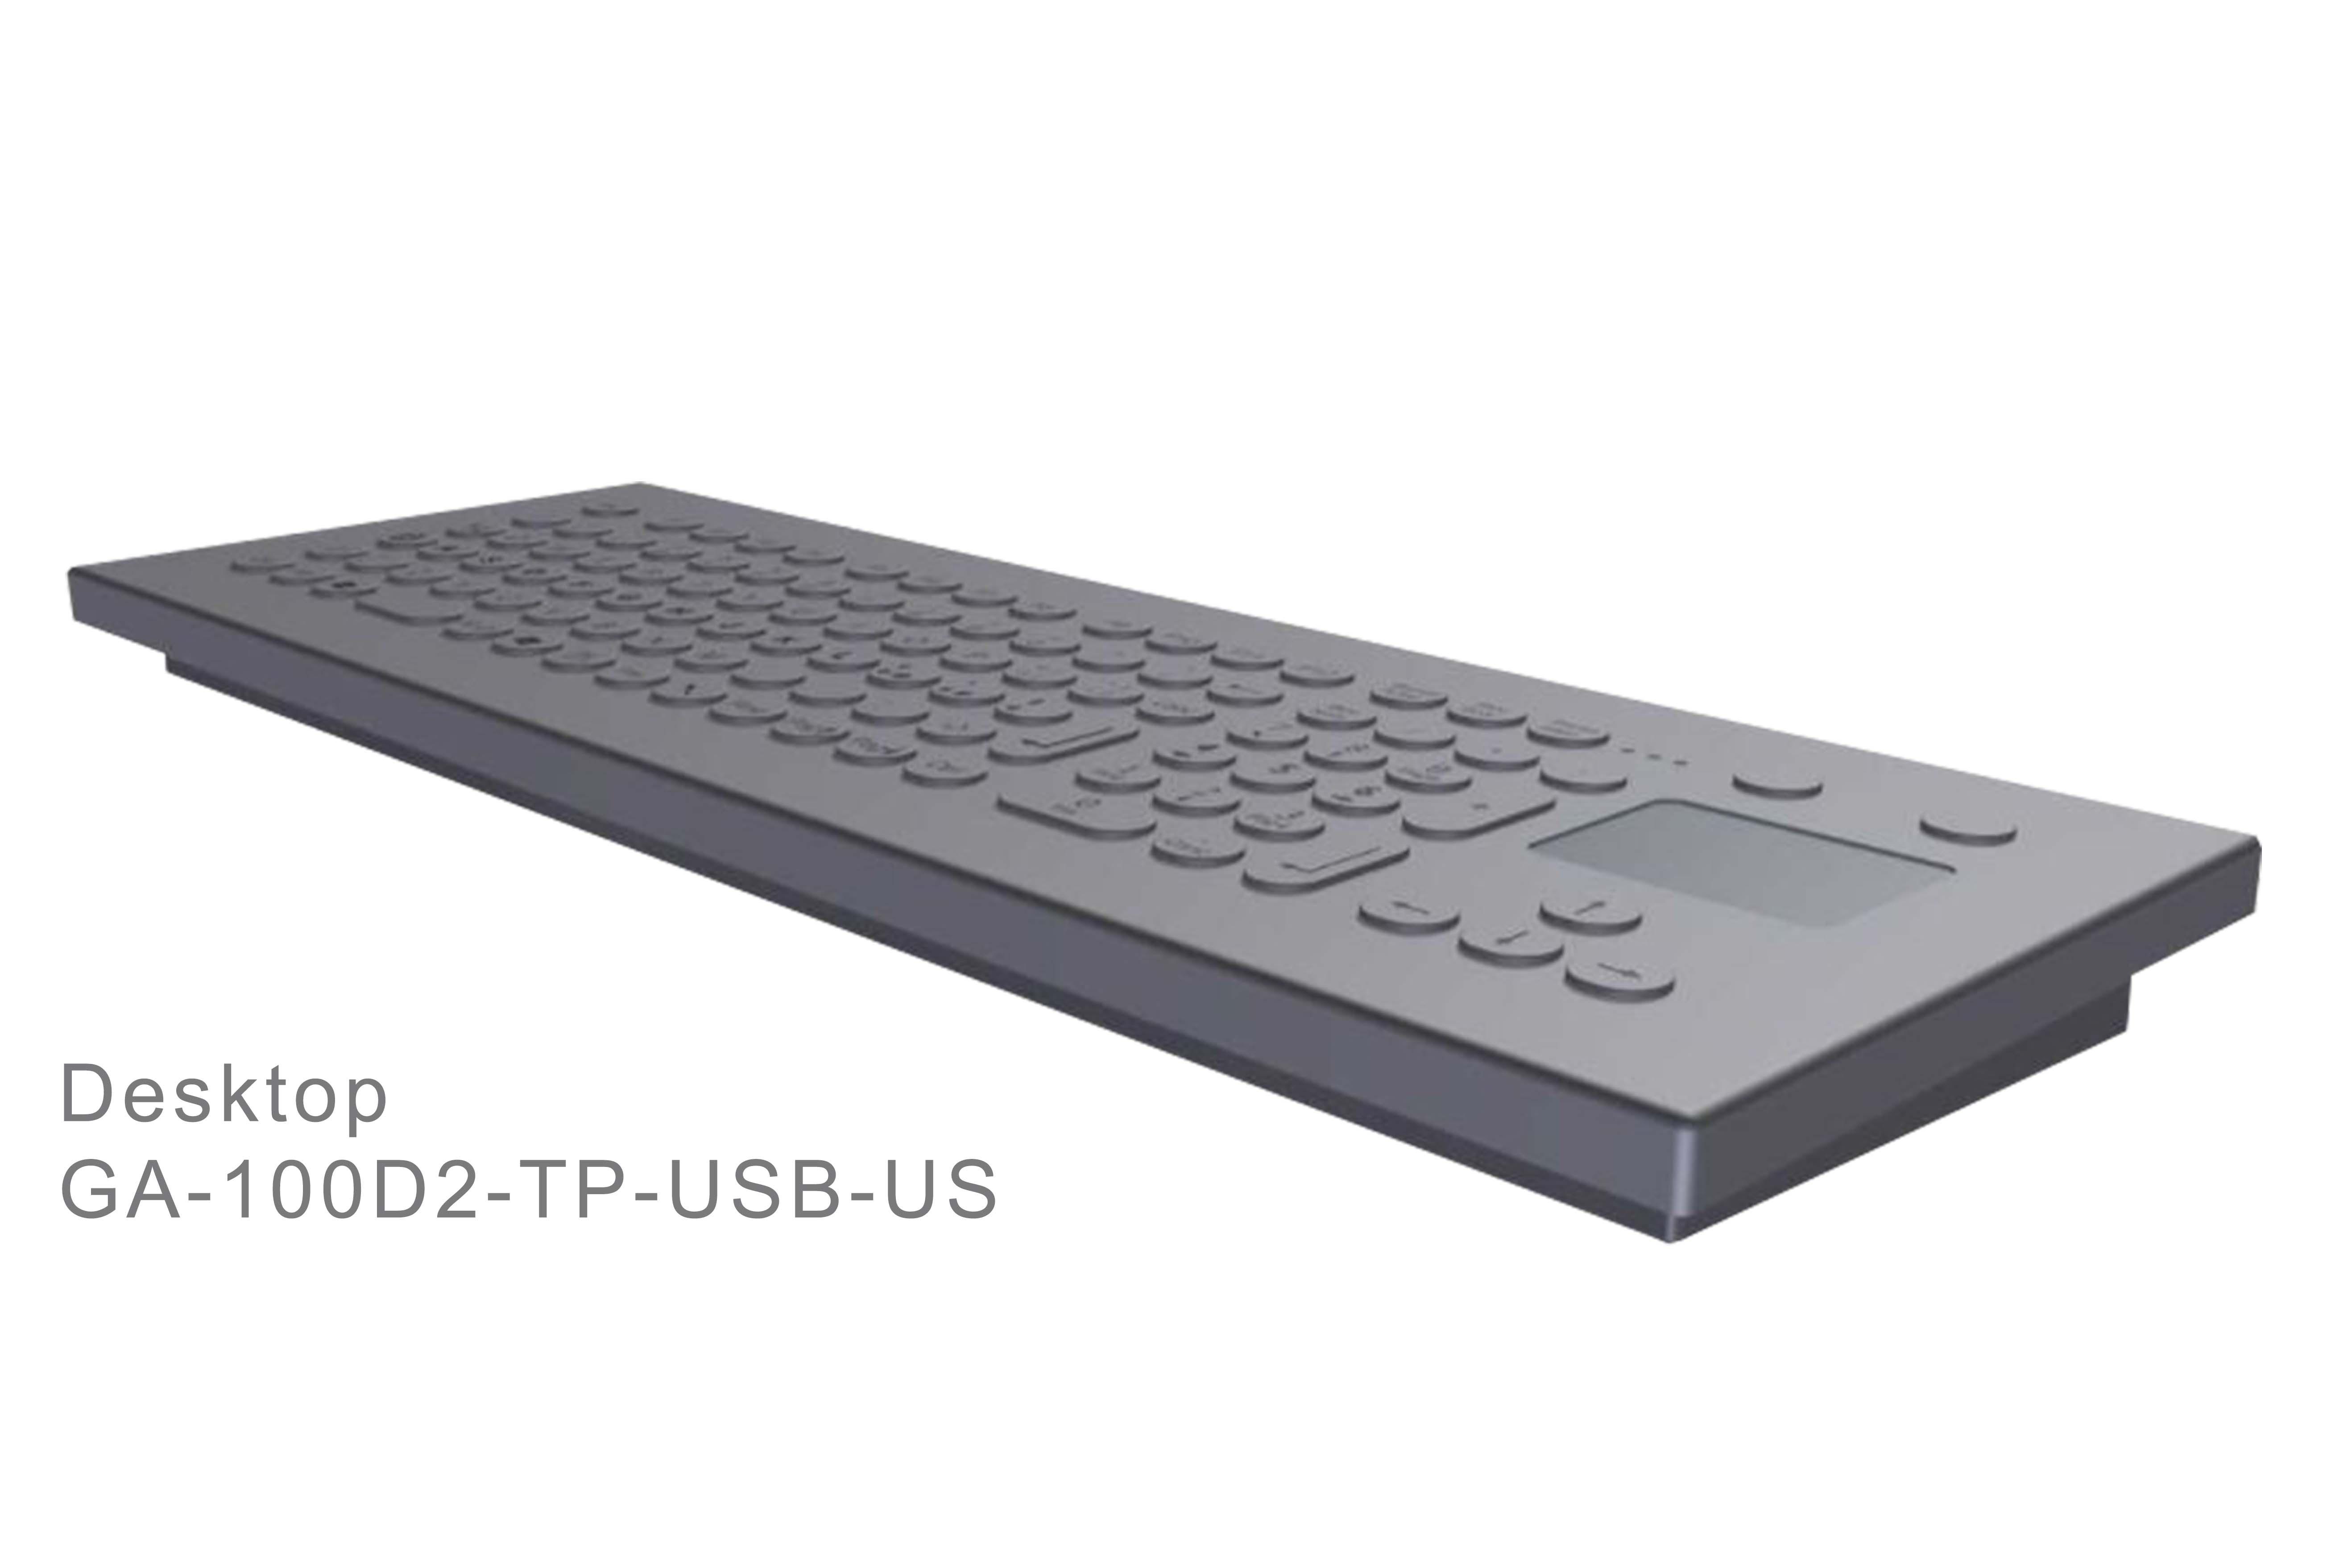 GA-Industrial-Italian Brand-100+Keys Touchpad Desktop-L